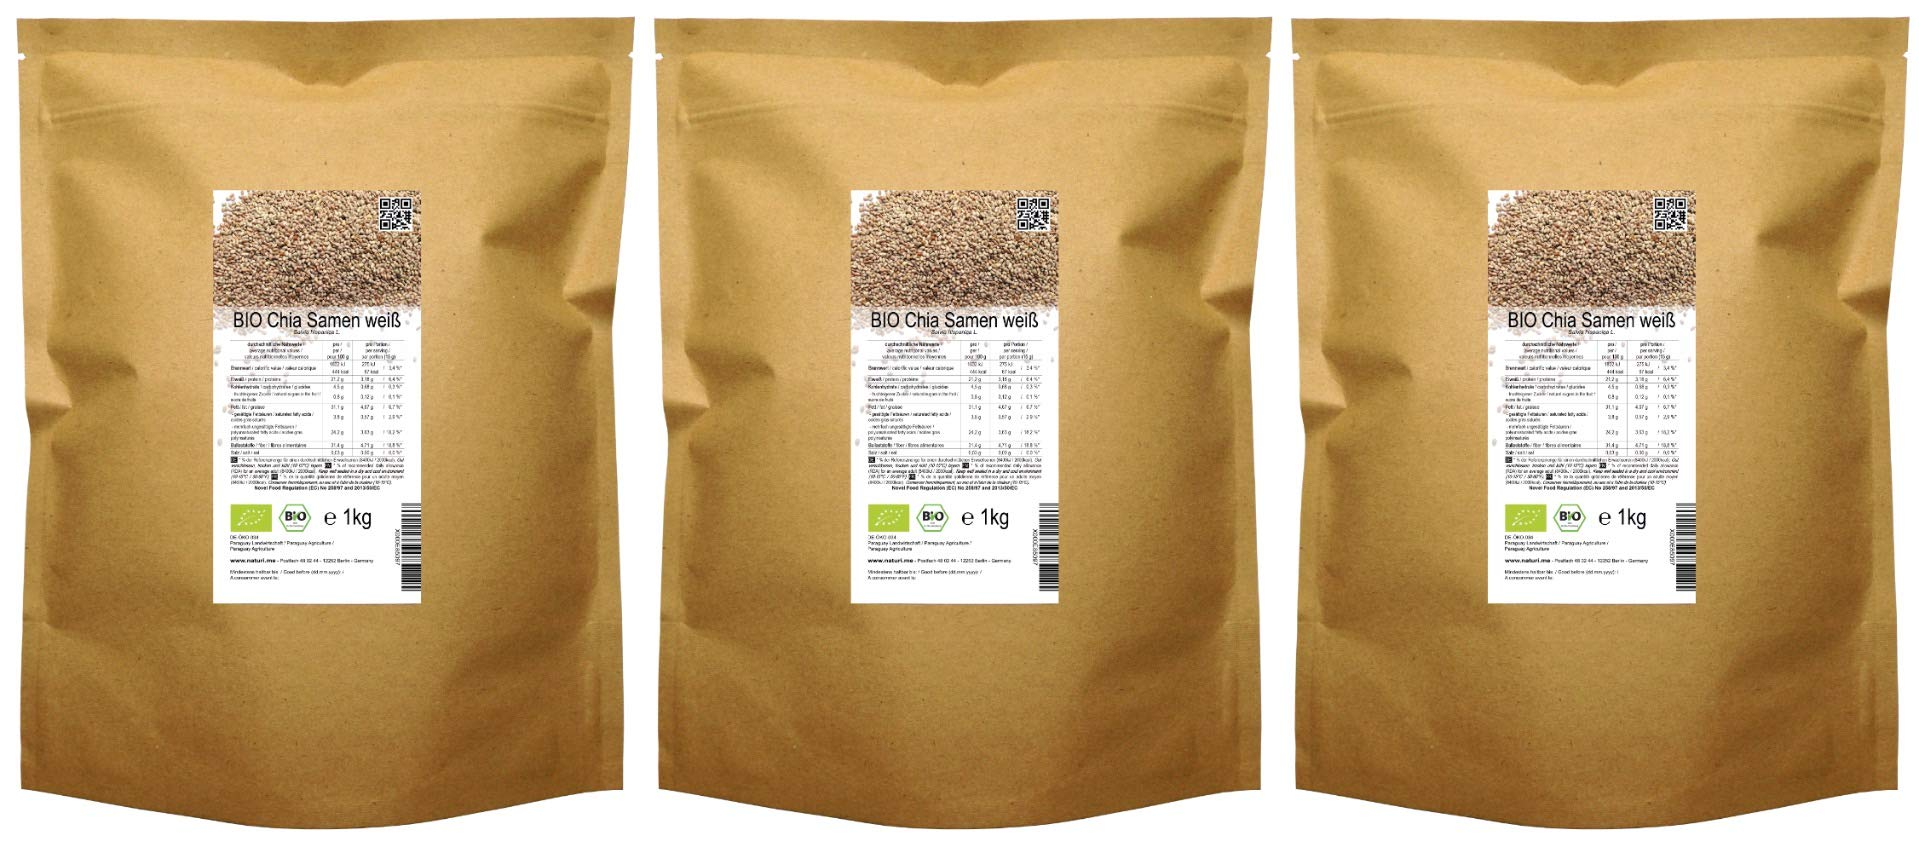 BIO Chia Samen weiß (3 kg ( 3 x 1 kg )) product image